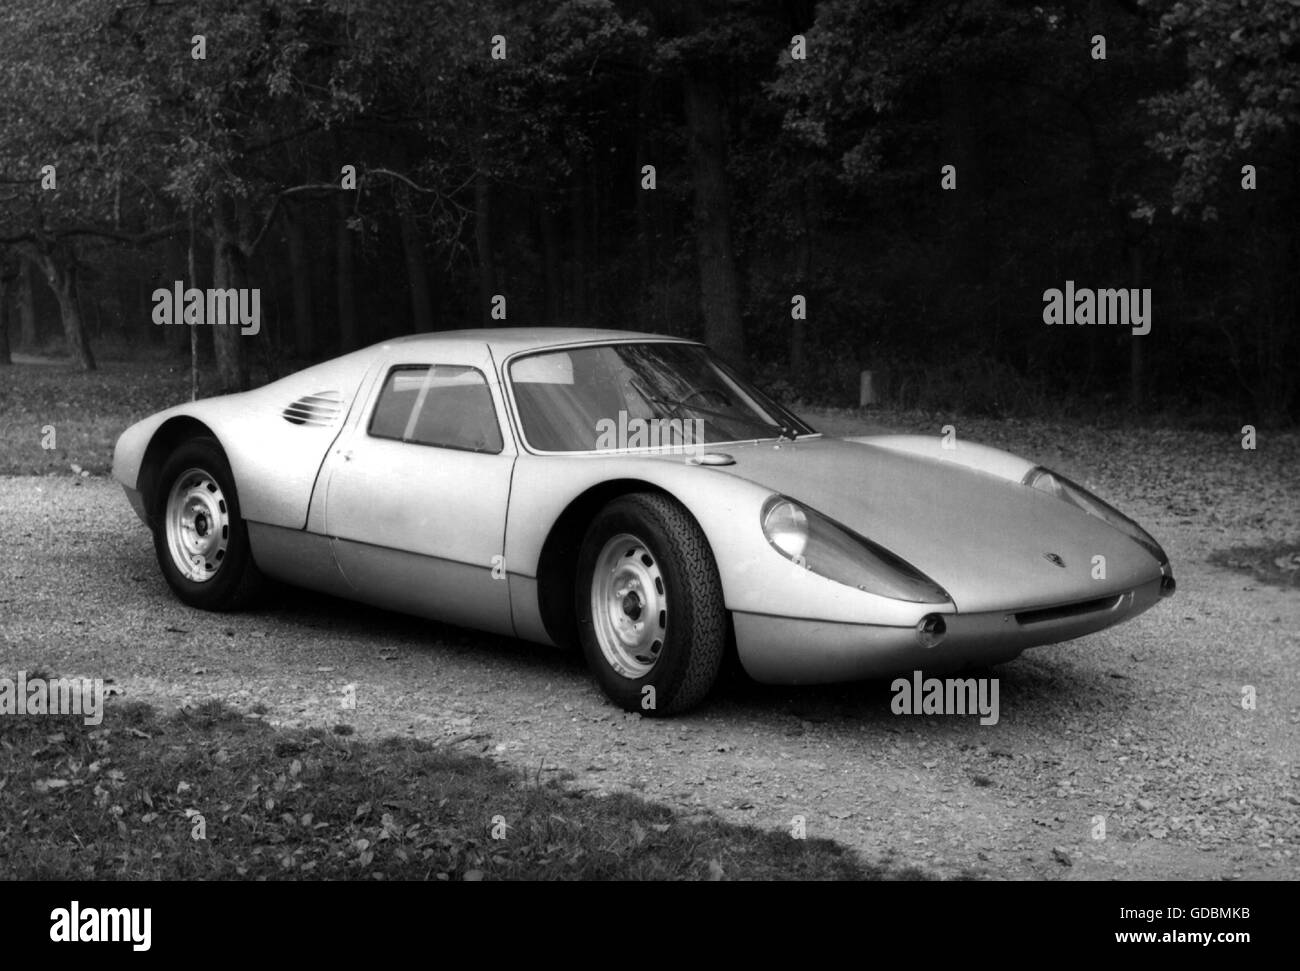 Transport/Verkehr, Autos, Typ, Porsche GT 904, 1970 s,, Additional-Rights - Clearences-NA Stockbild